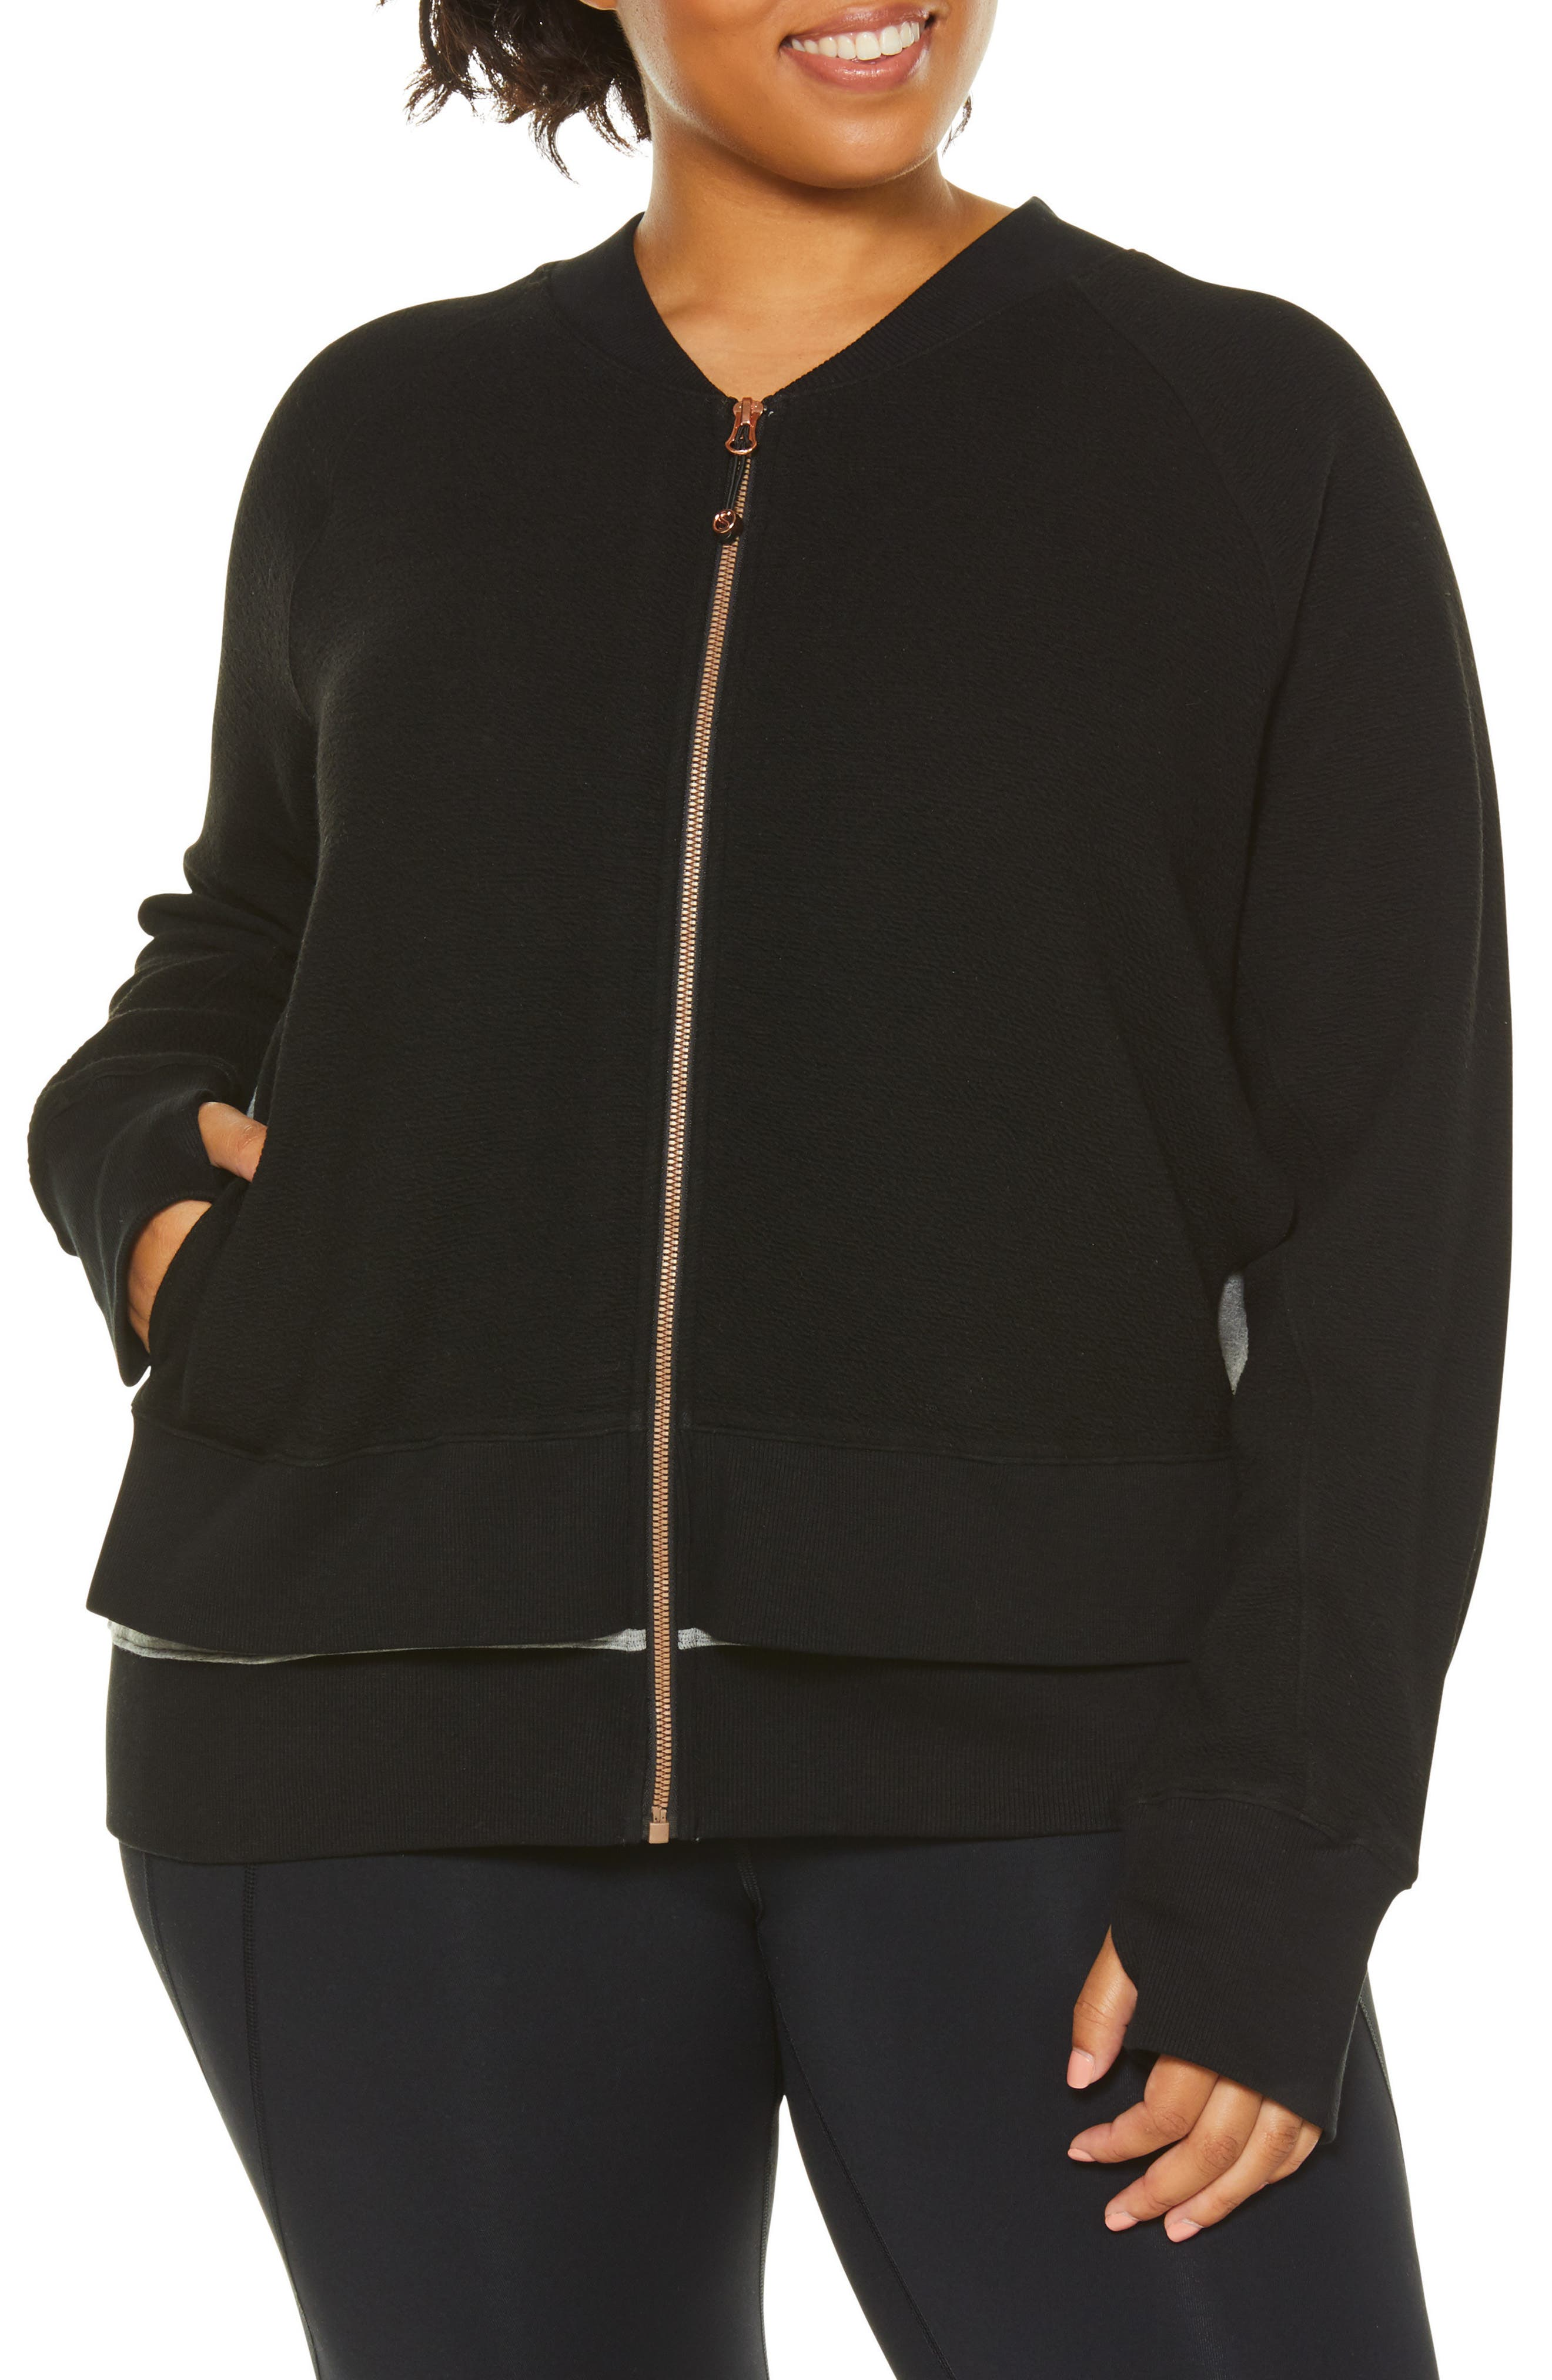 Sublime Double Layer Jacket,                         Main,                         color, BLACK/ GREY HEATHER